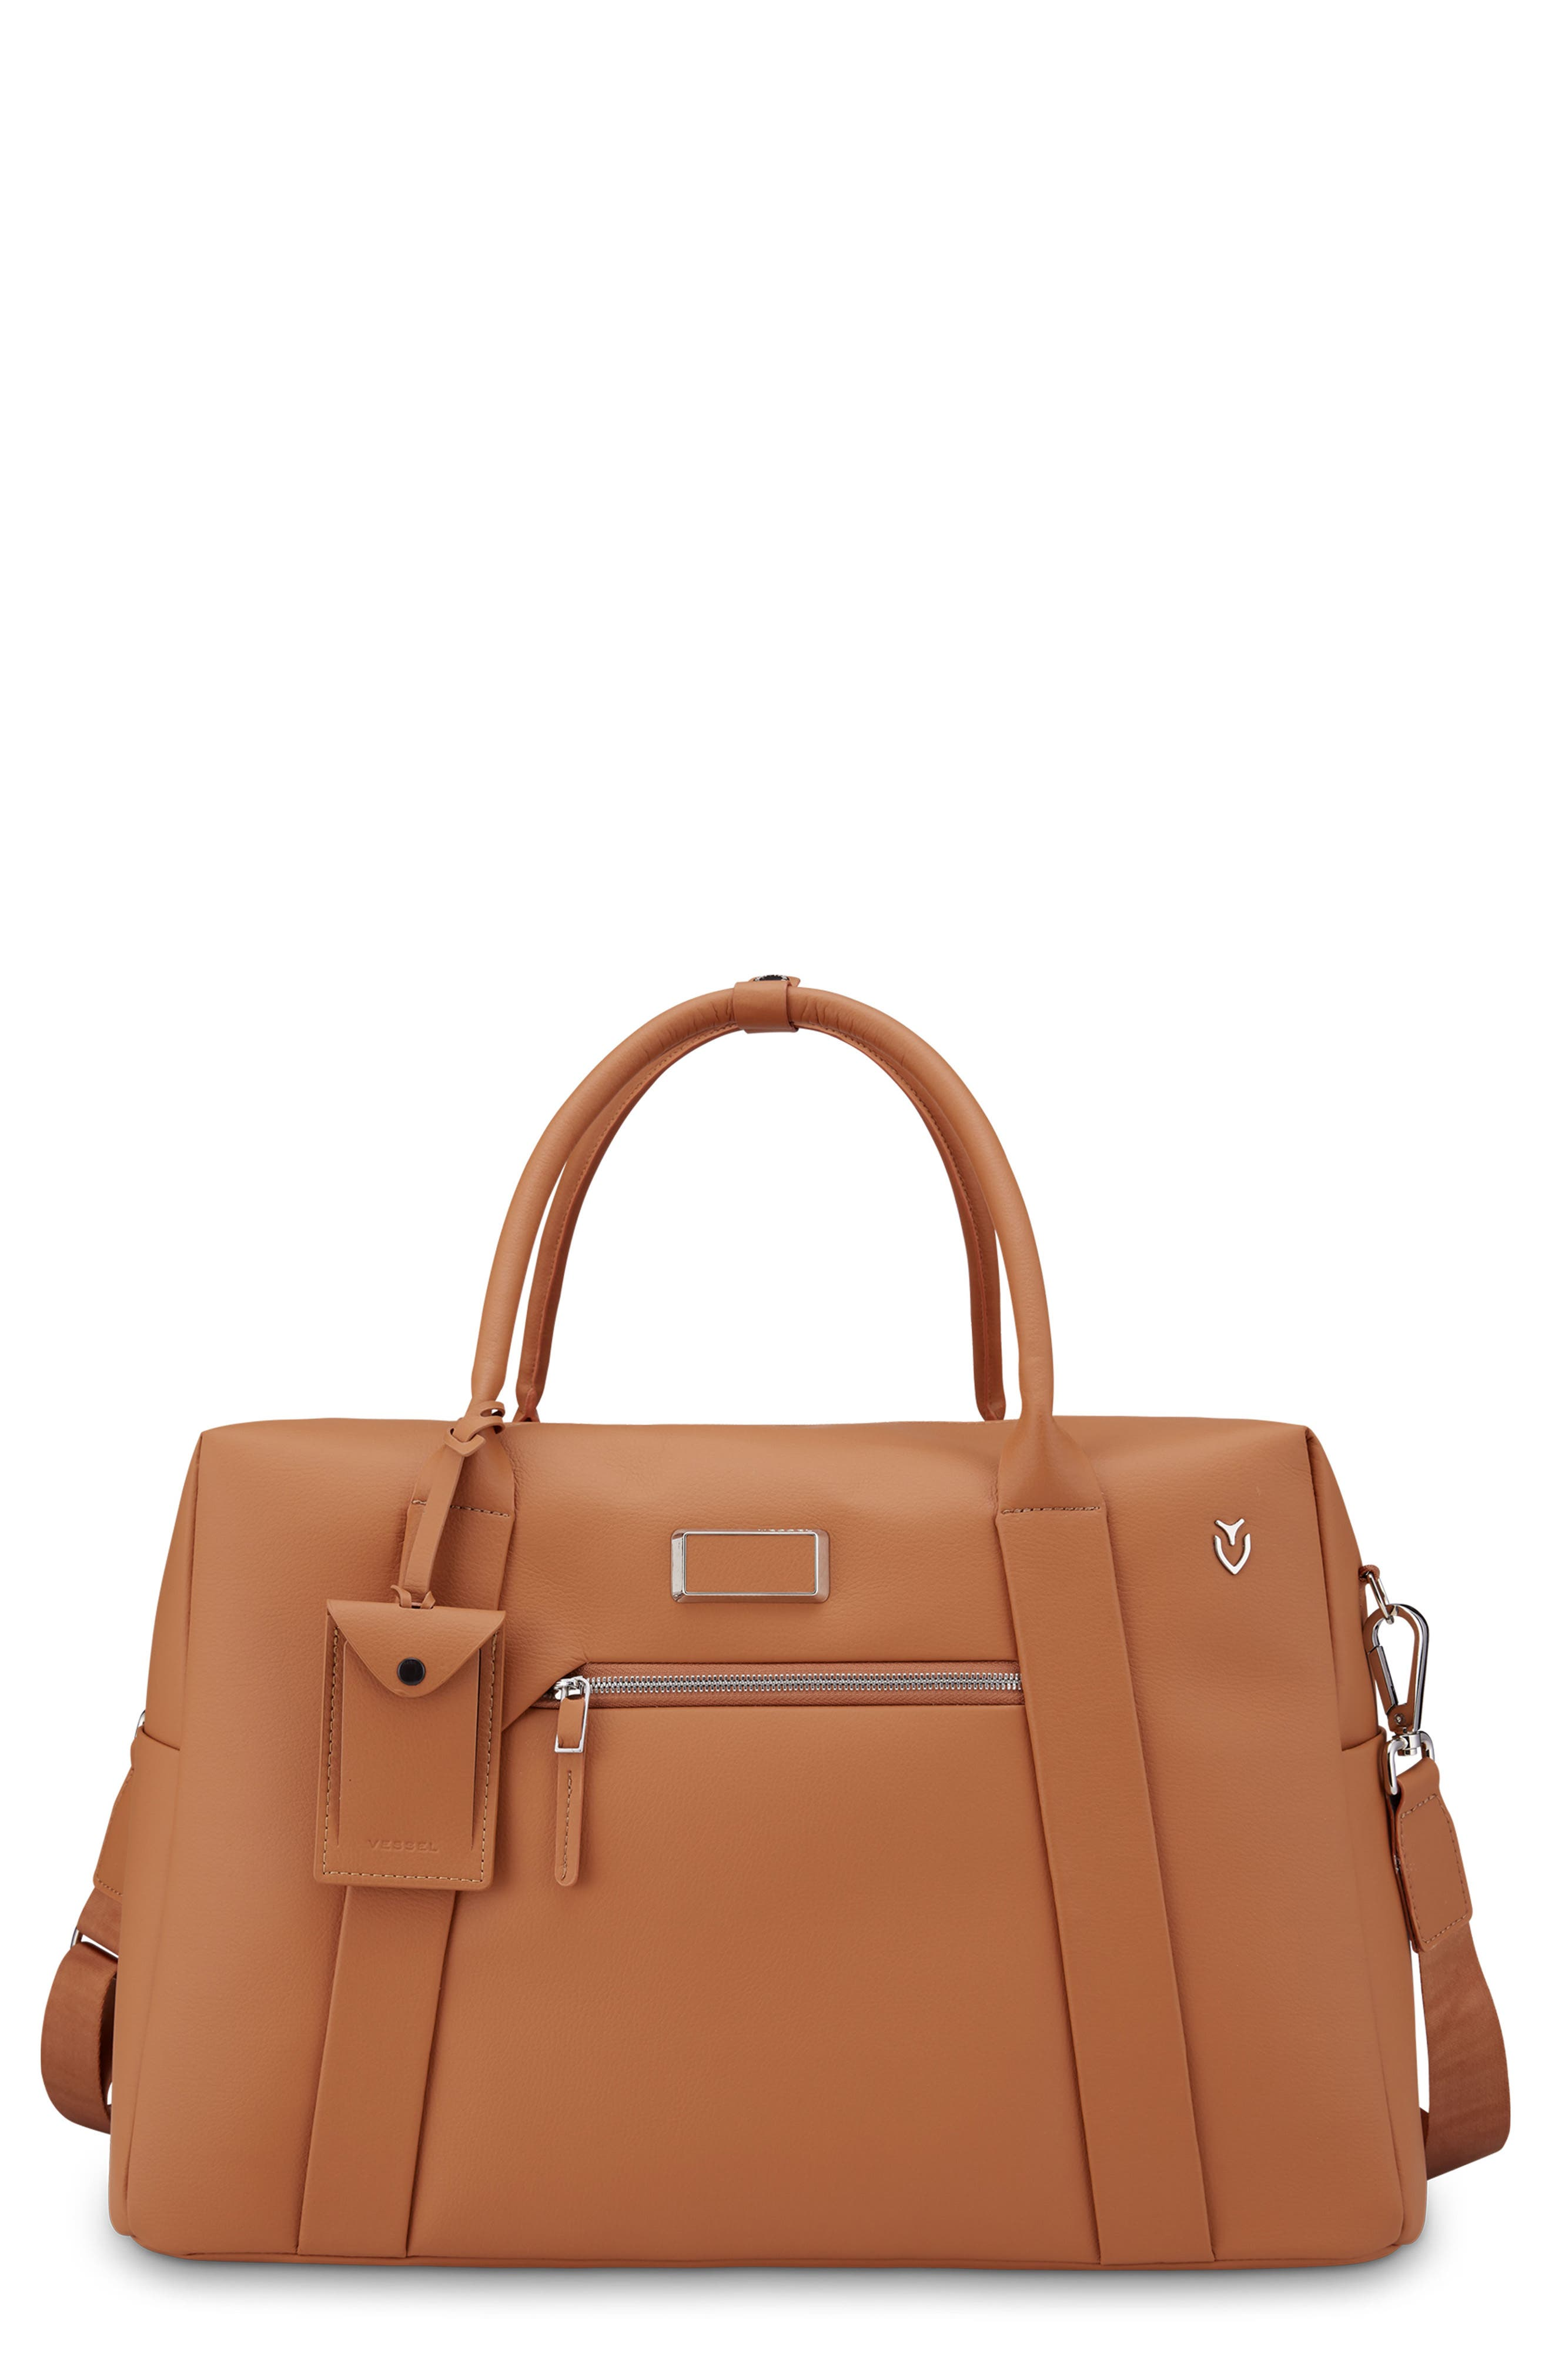 Vessel Signature 2.0 Faux Leather Duffel Bag